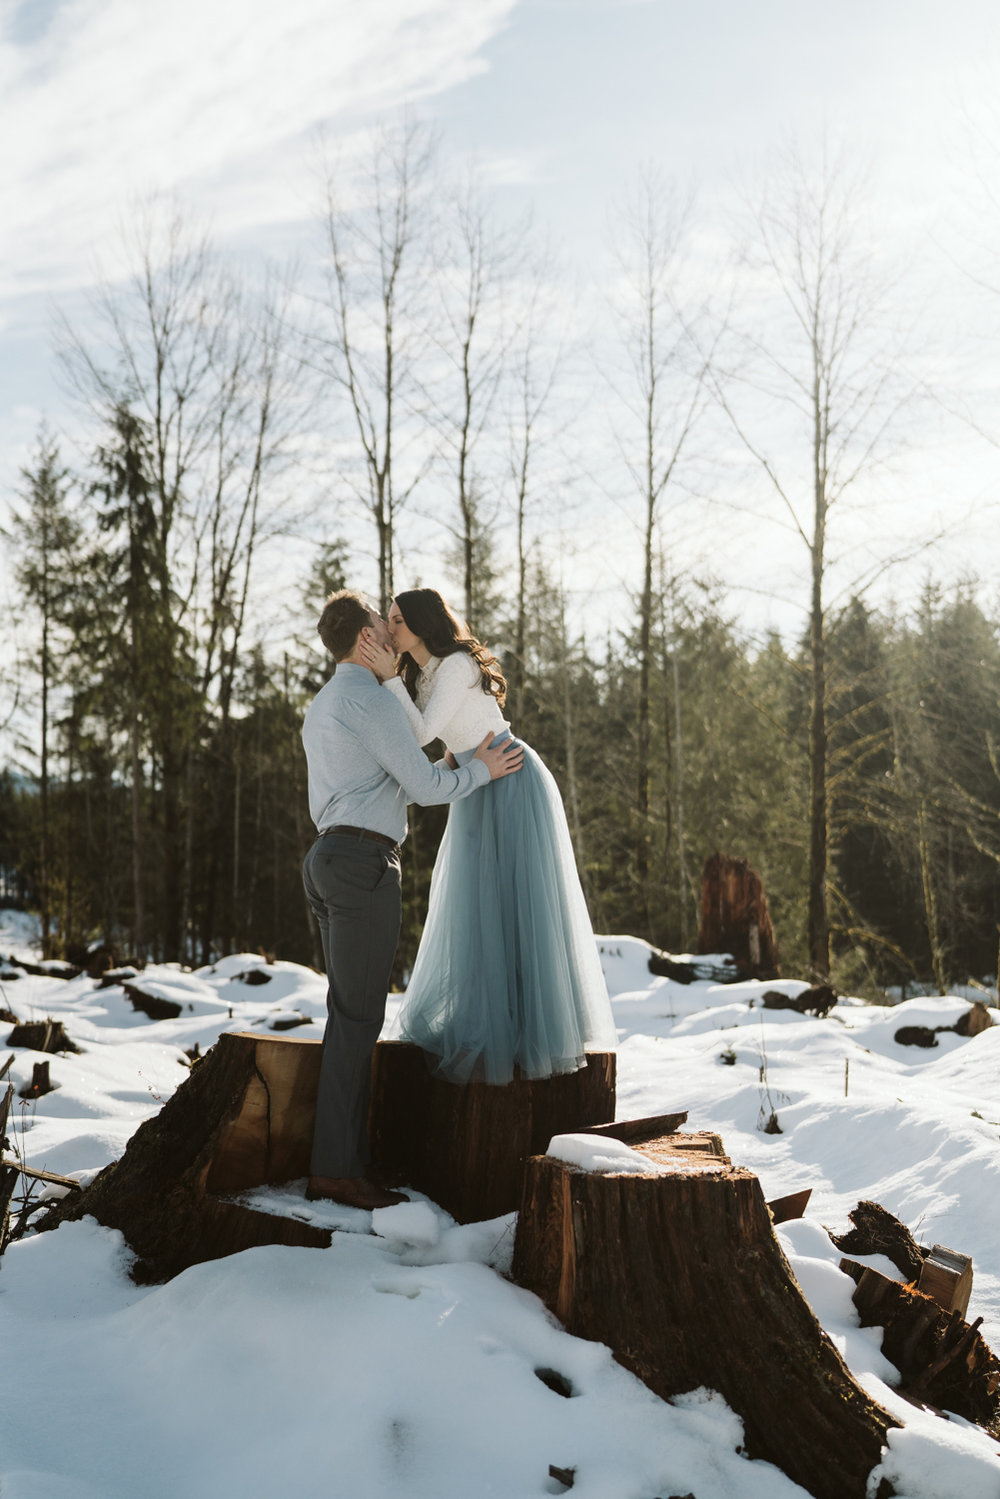 April Yentas Photography - Ethan & Nerissa-25.jpg